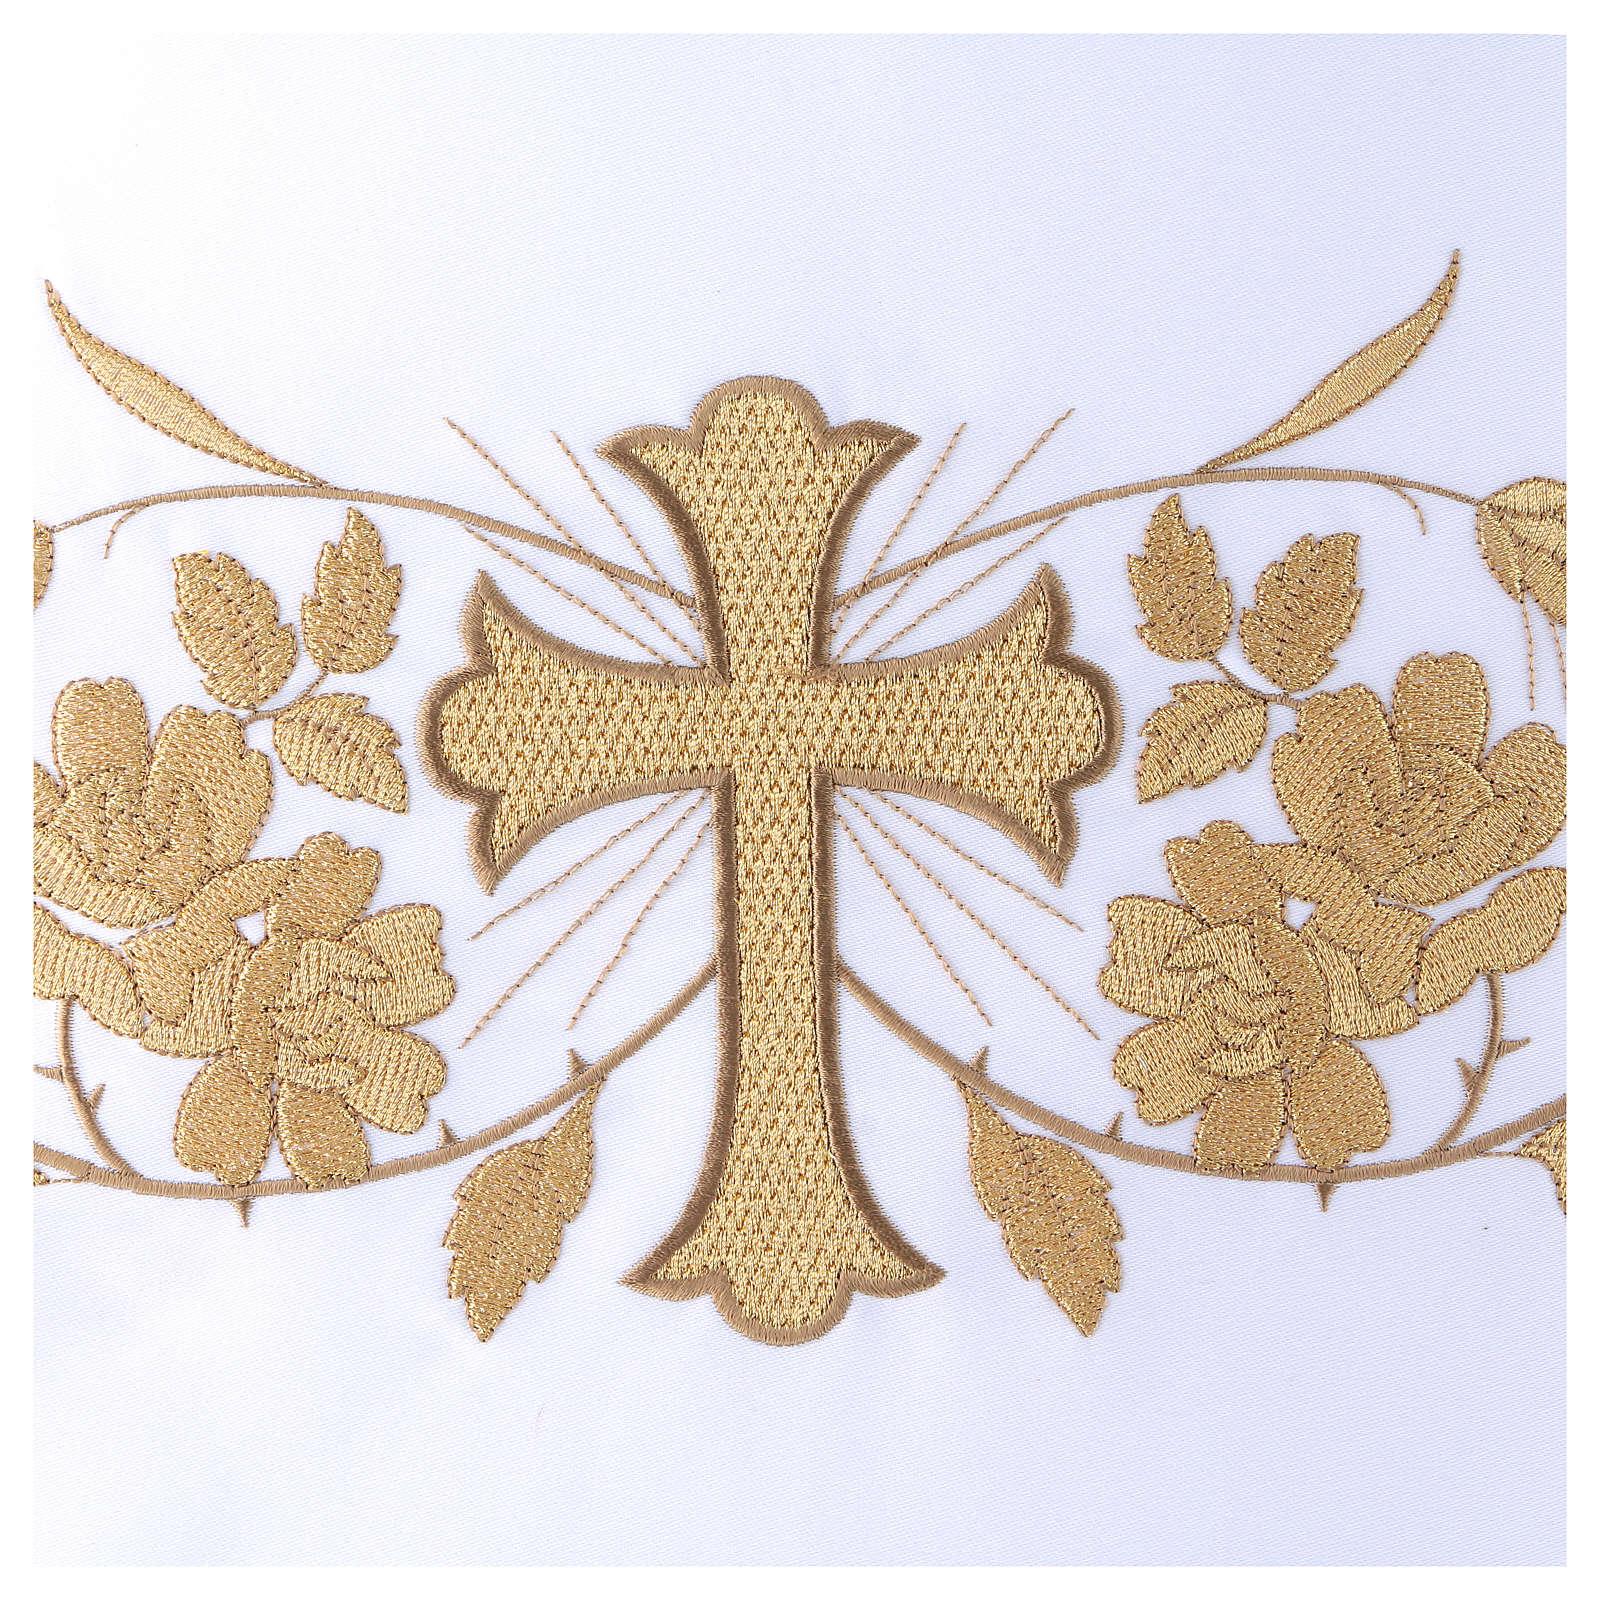 Mantel de altar 165x300 cm detalles bordados dorados flores y cruz central 4